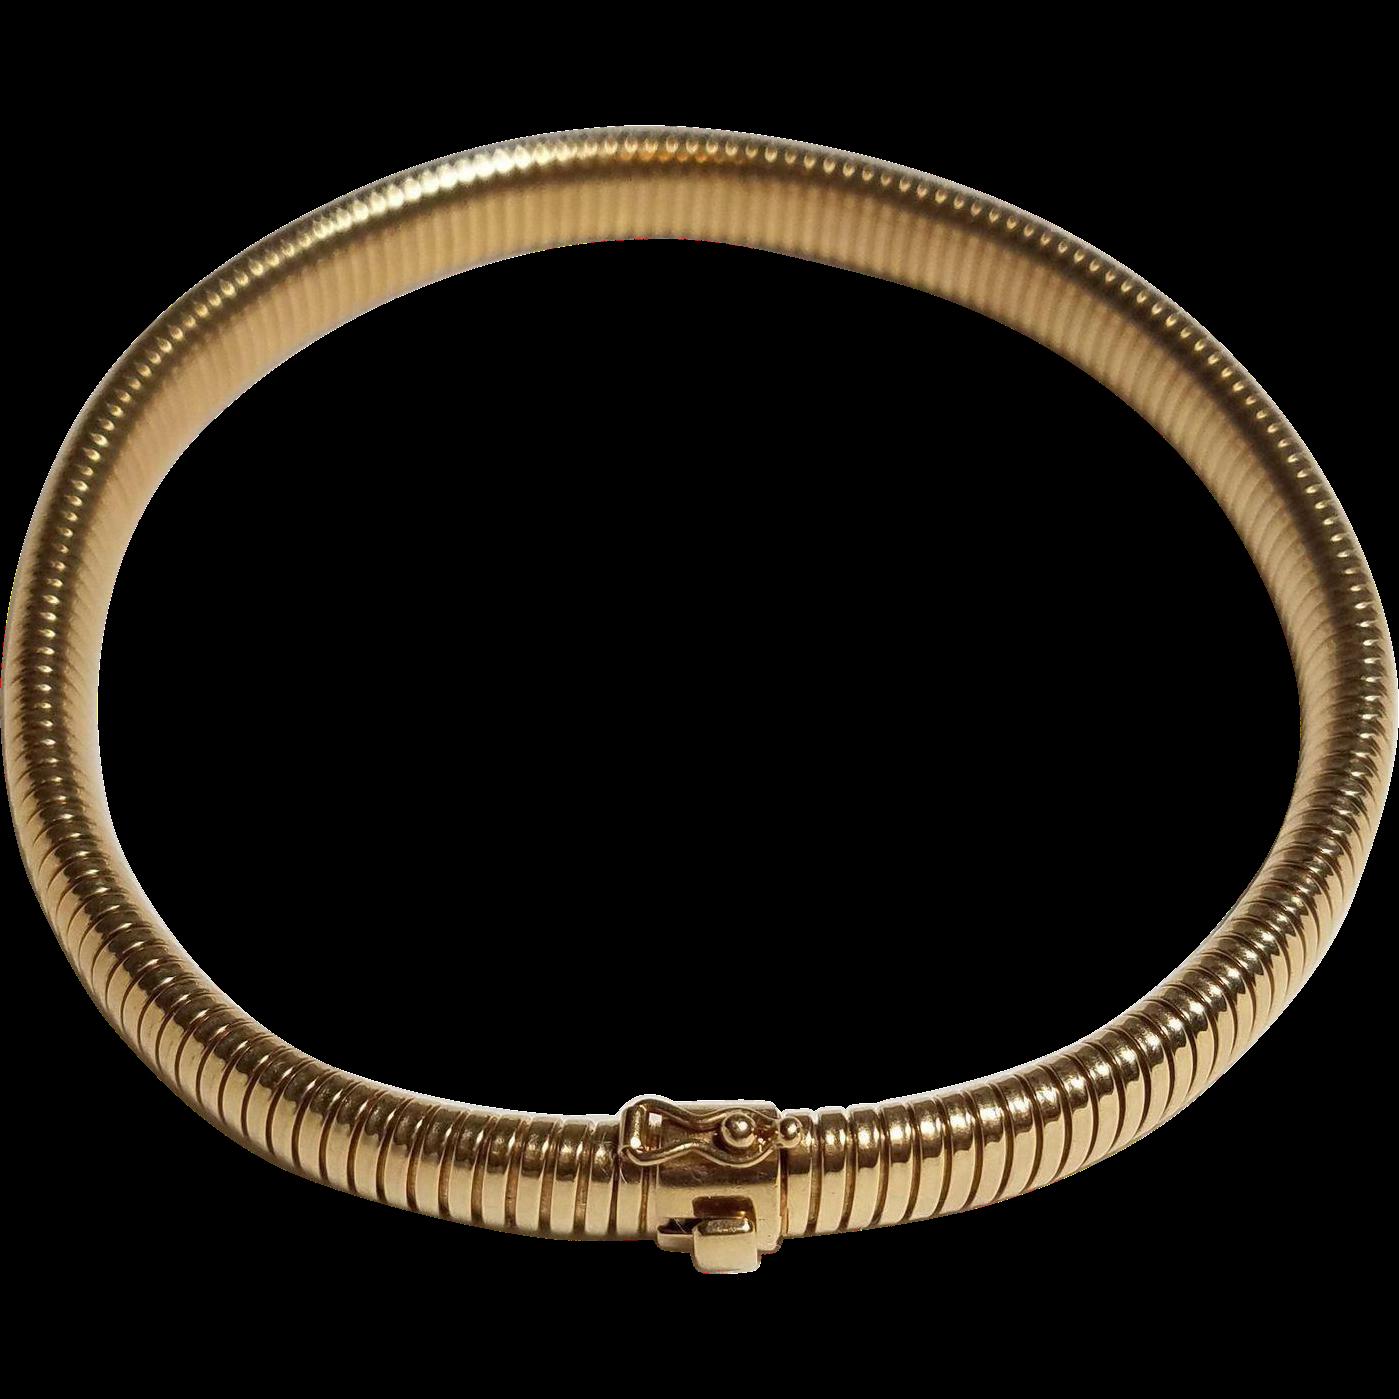 14k Gold Choker Necklace Tubogas Collier De Chien Or Dog